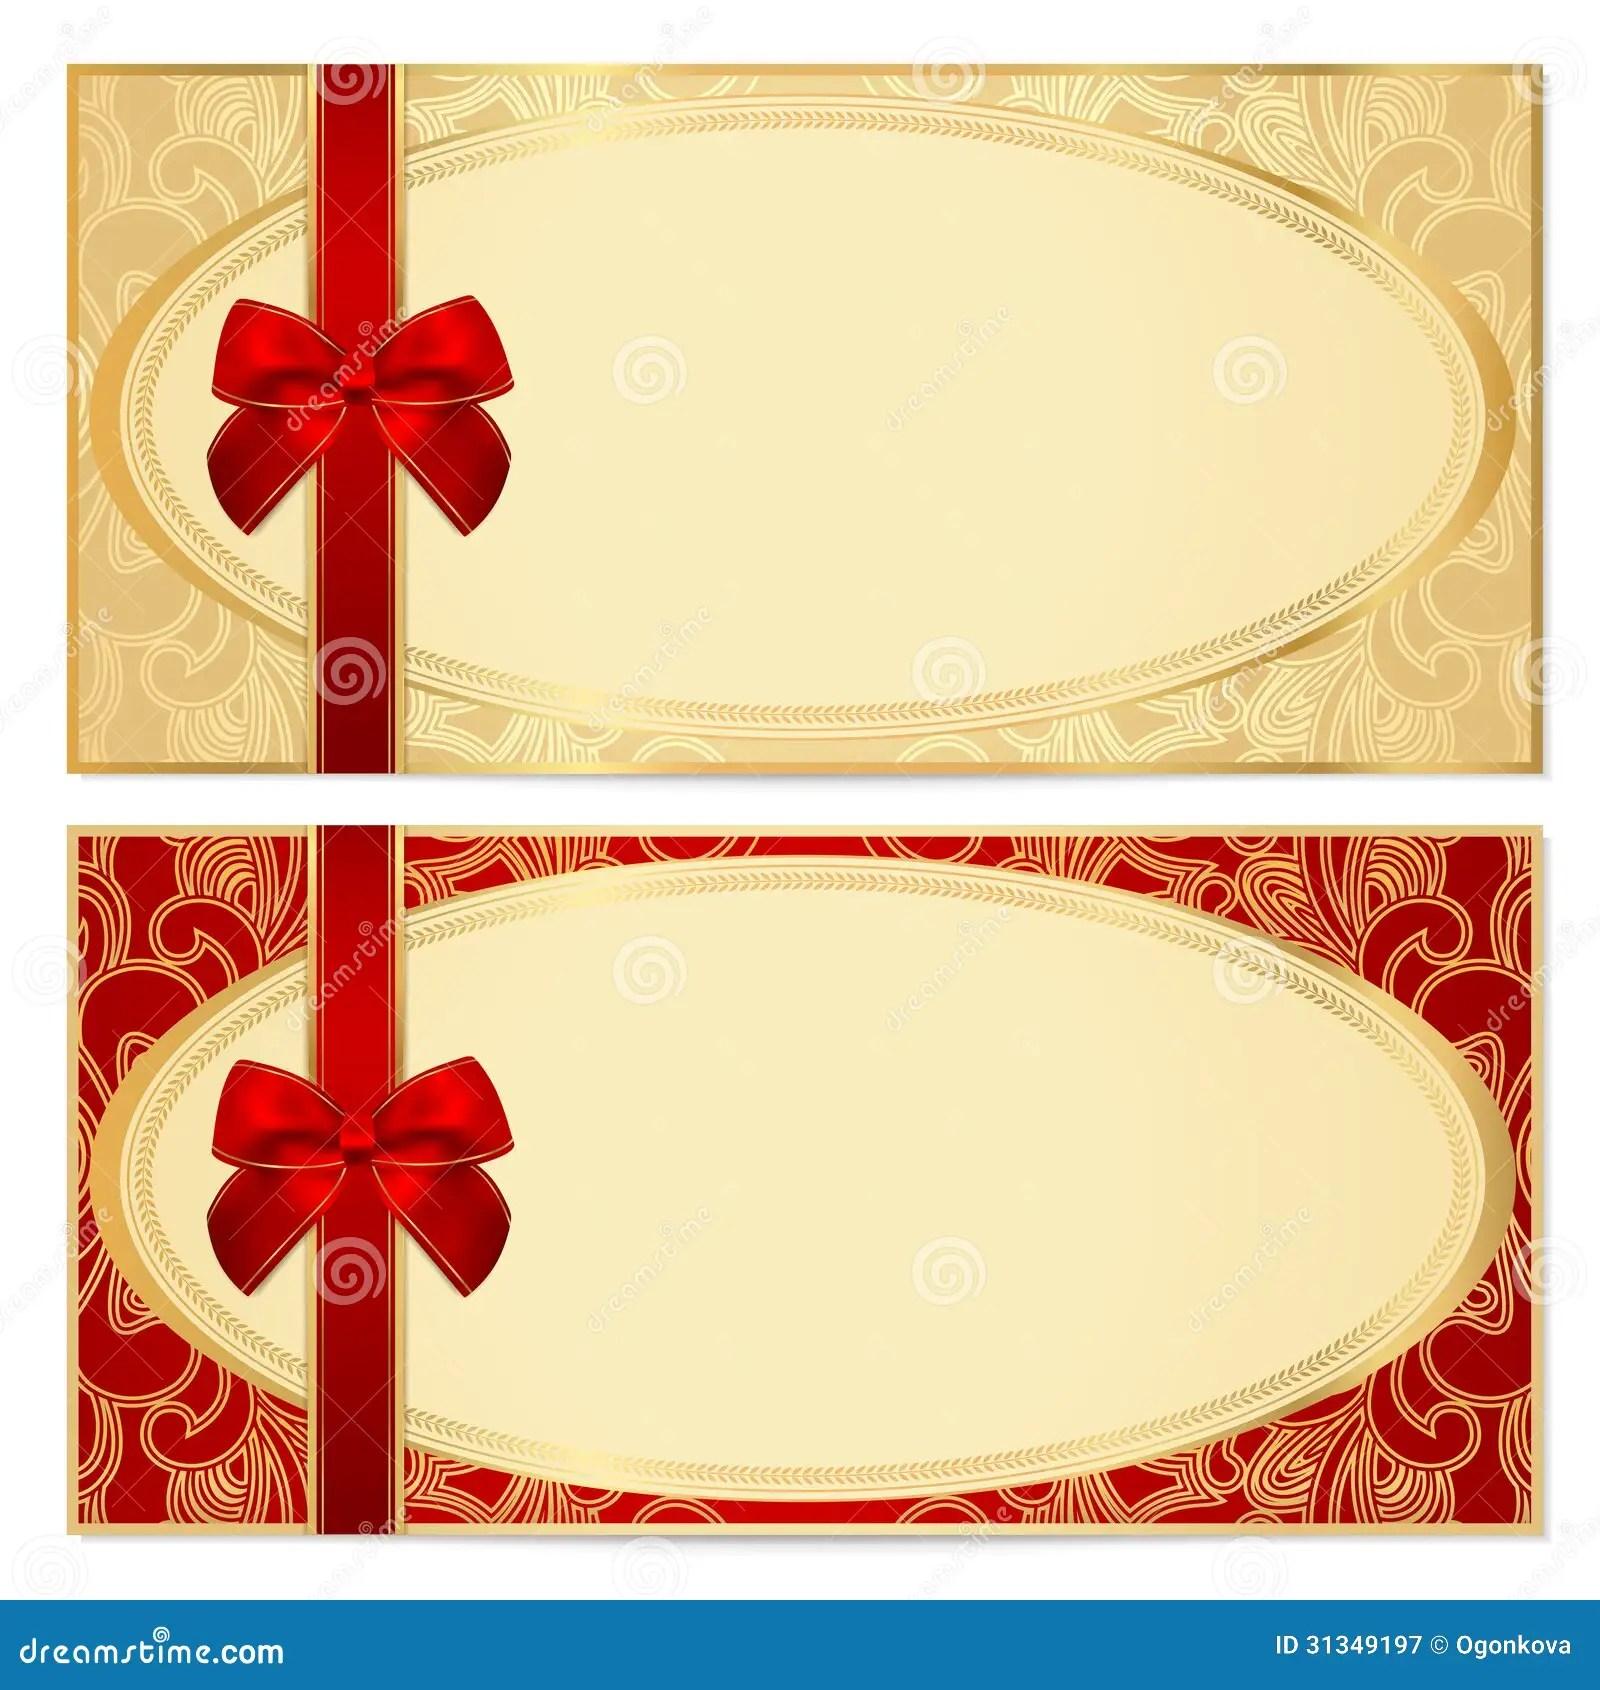 voucher template word – Gift Voucher Template Word Free Download